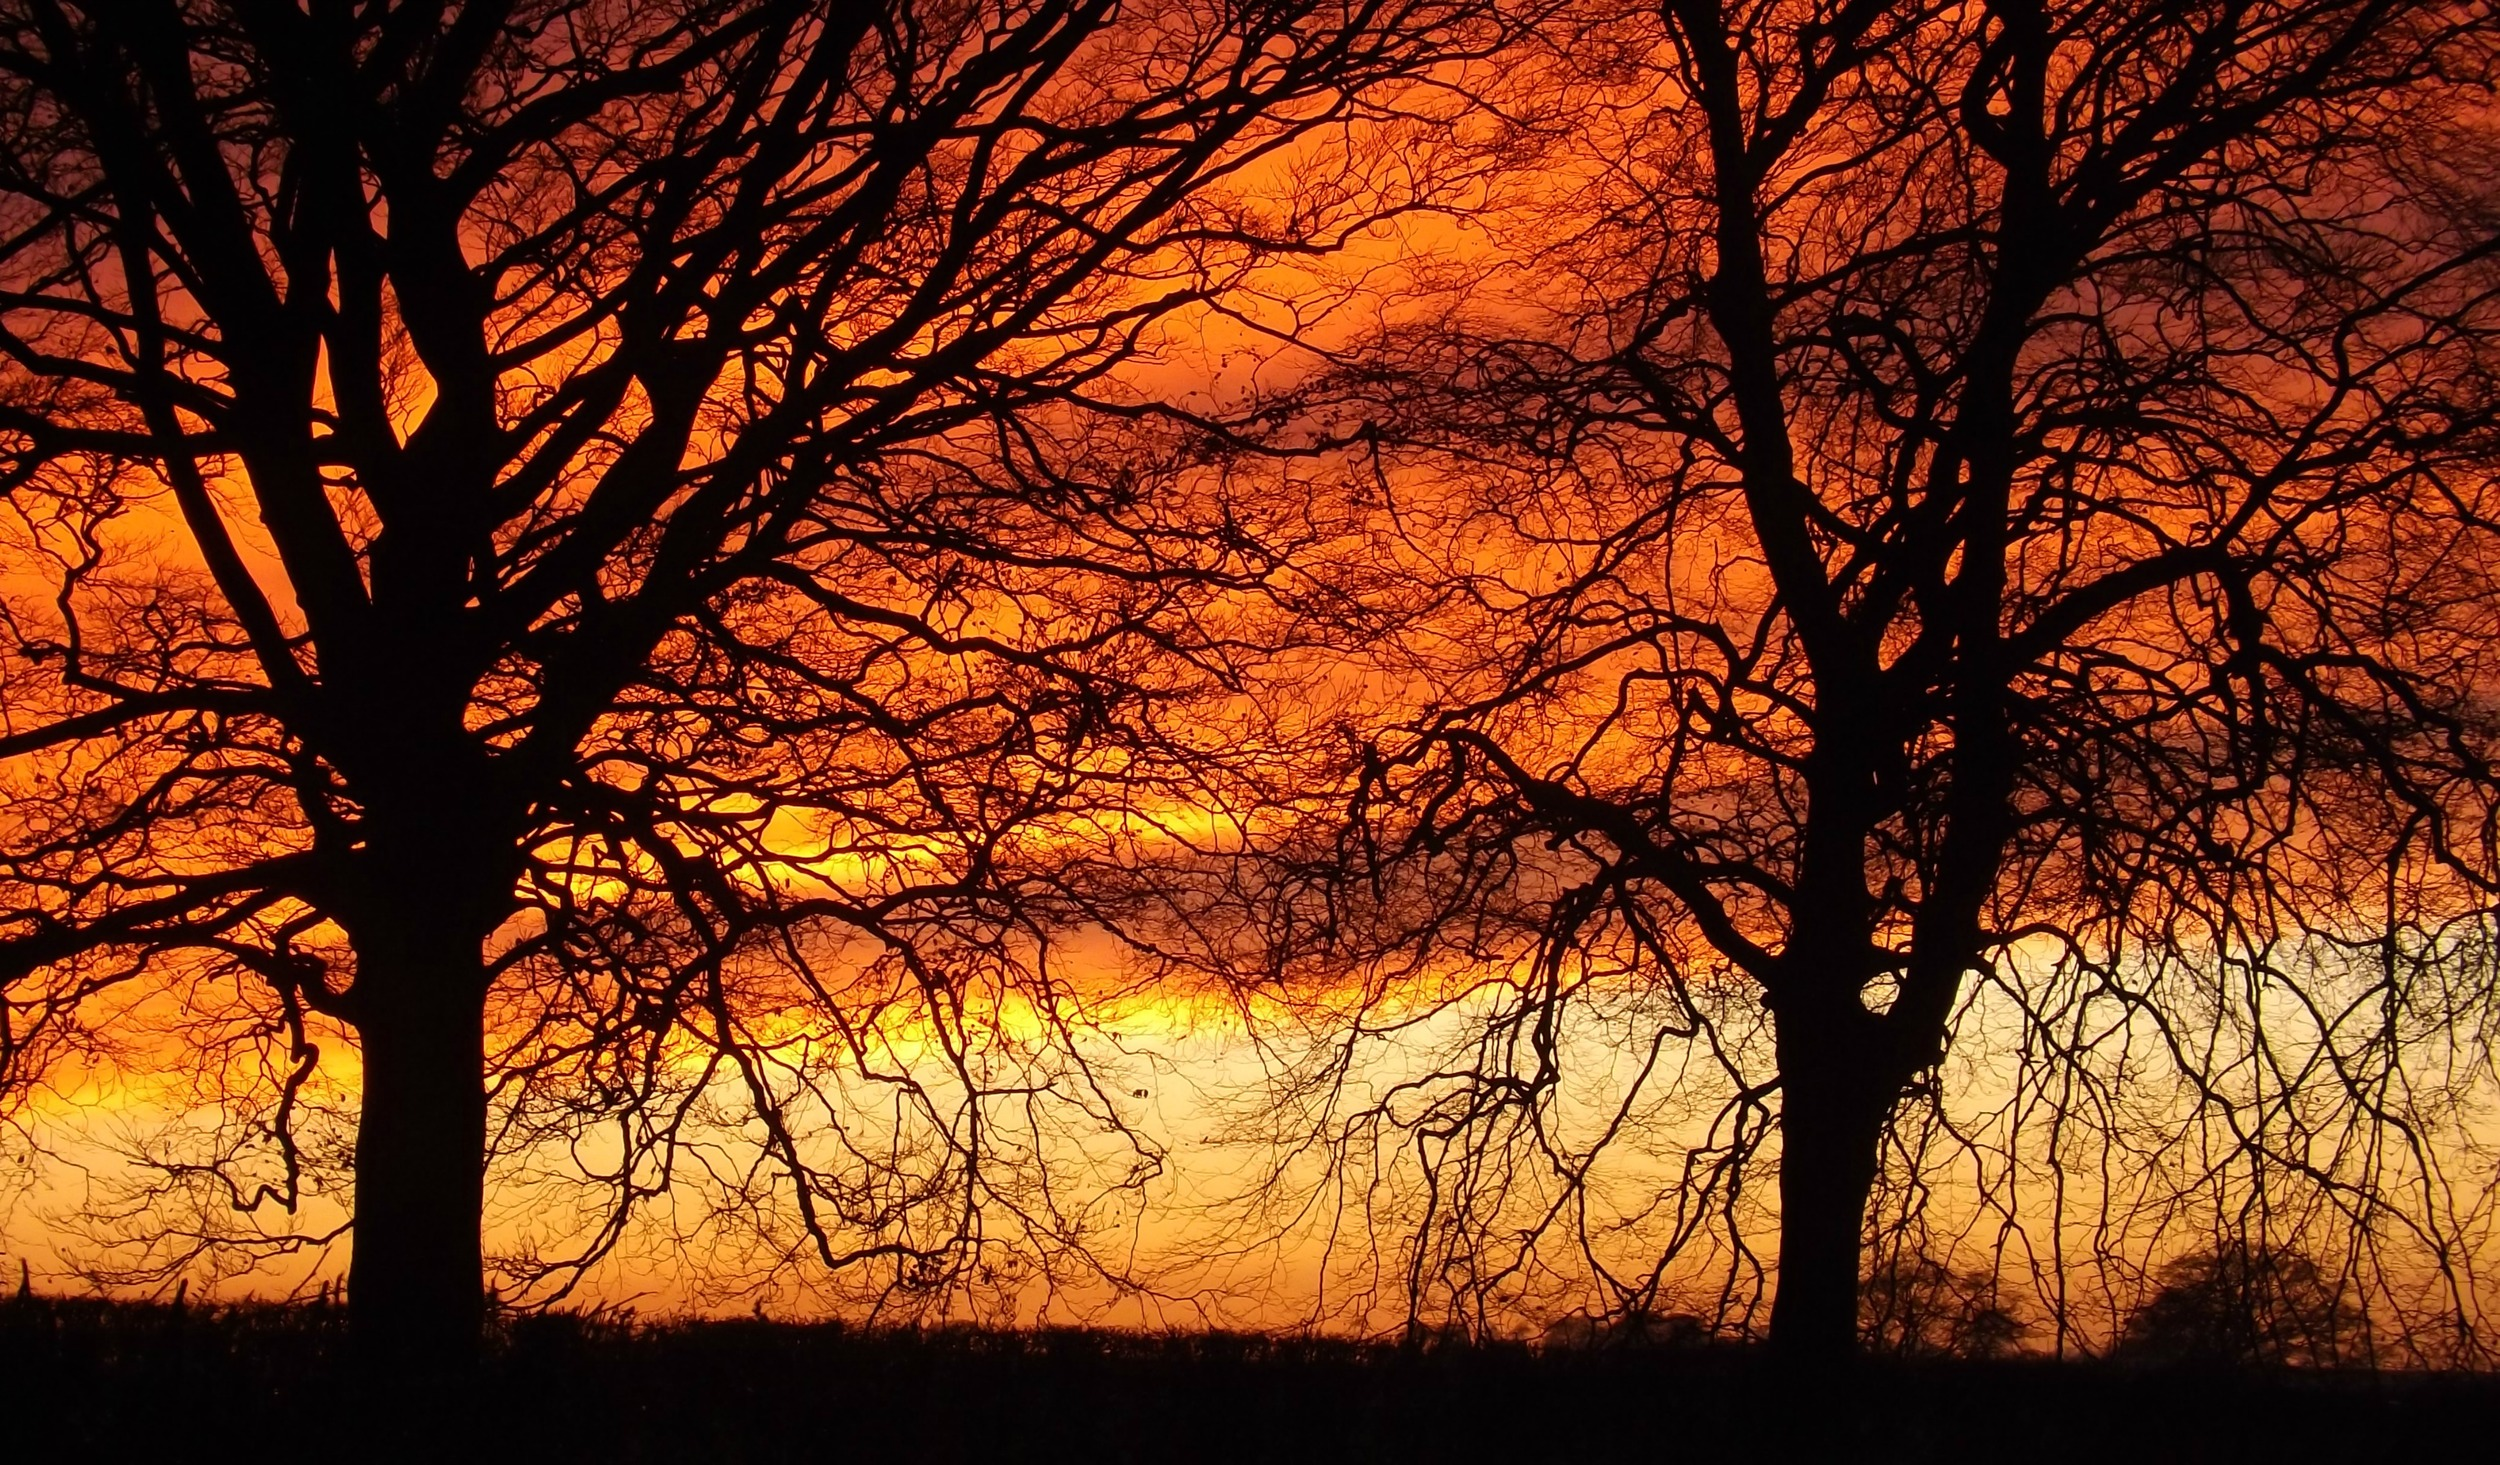 Sunset-Creative-Countryside